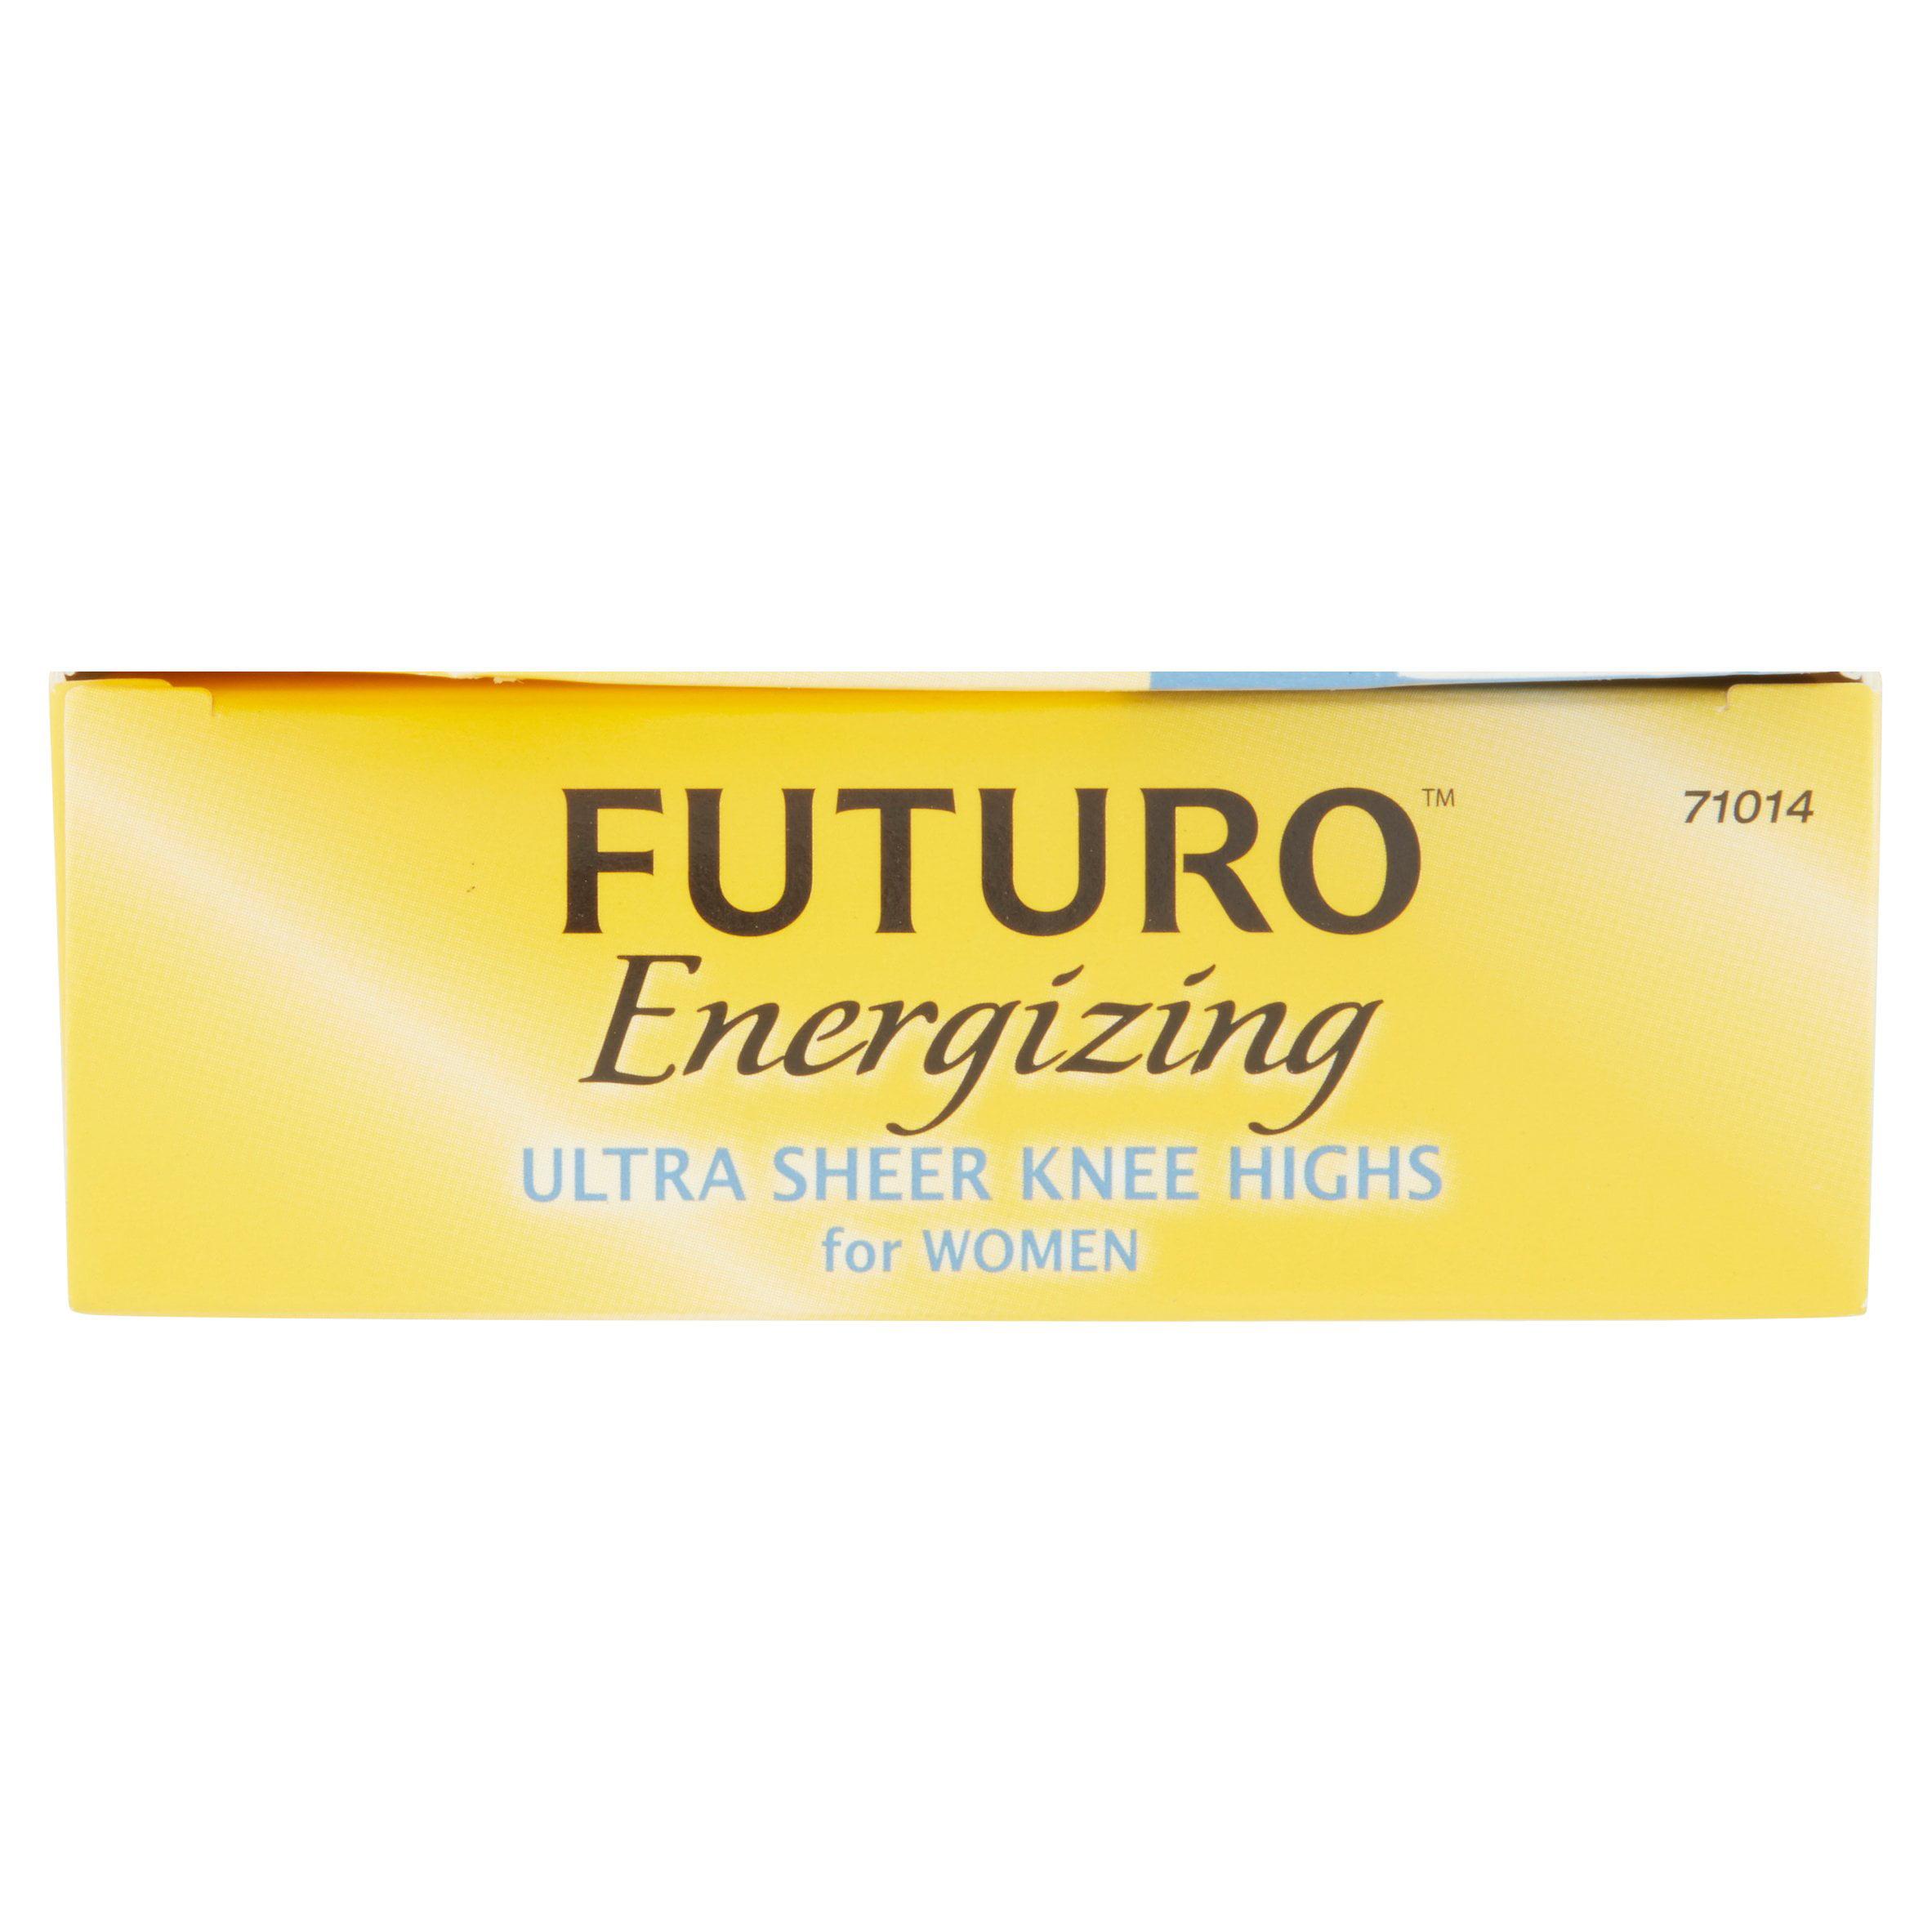 207f1aaec4b FUTURO - FUTURO Energizing Ultra Sheer Knee Highs for Women